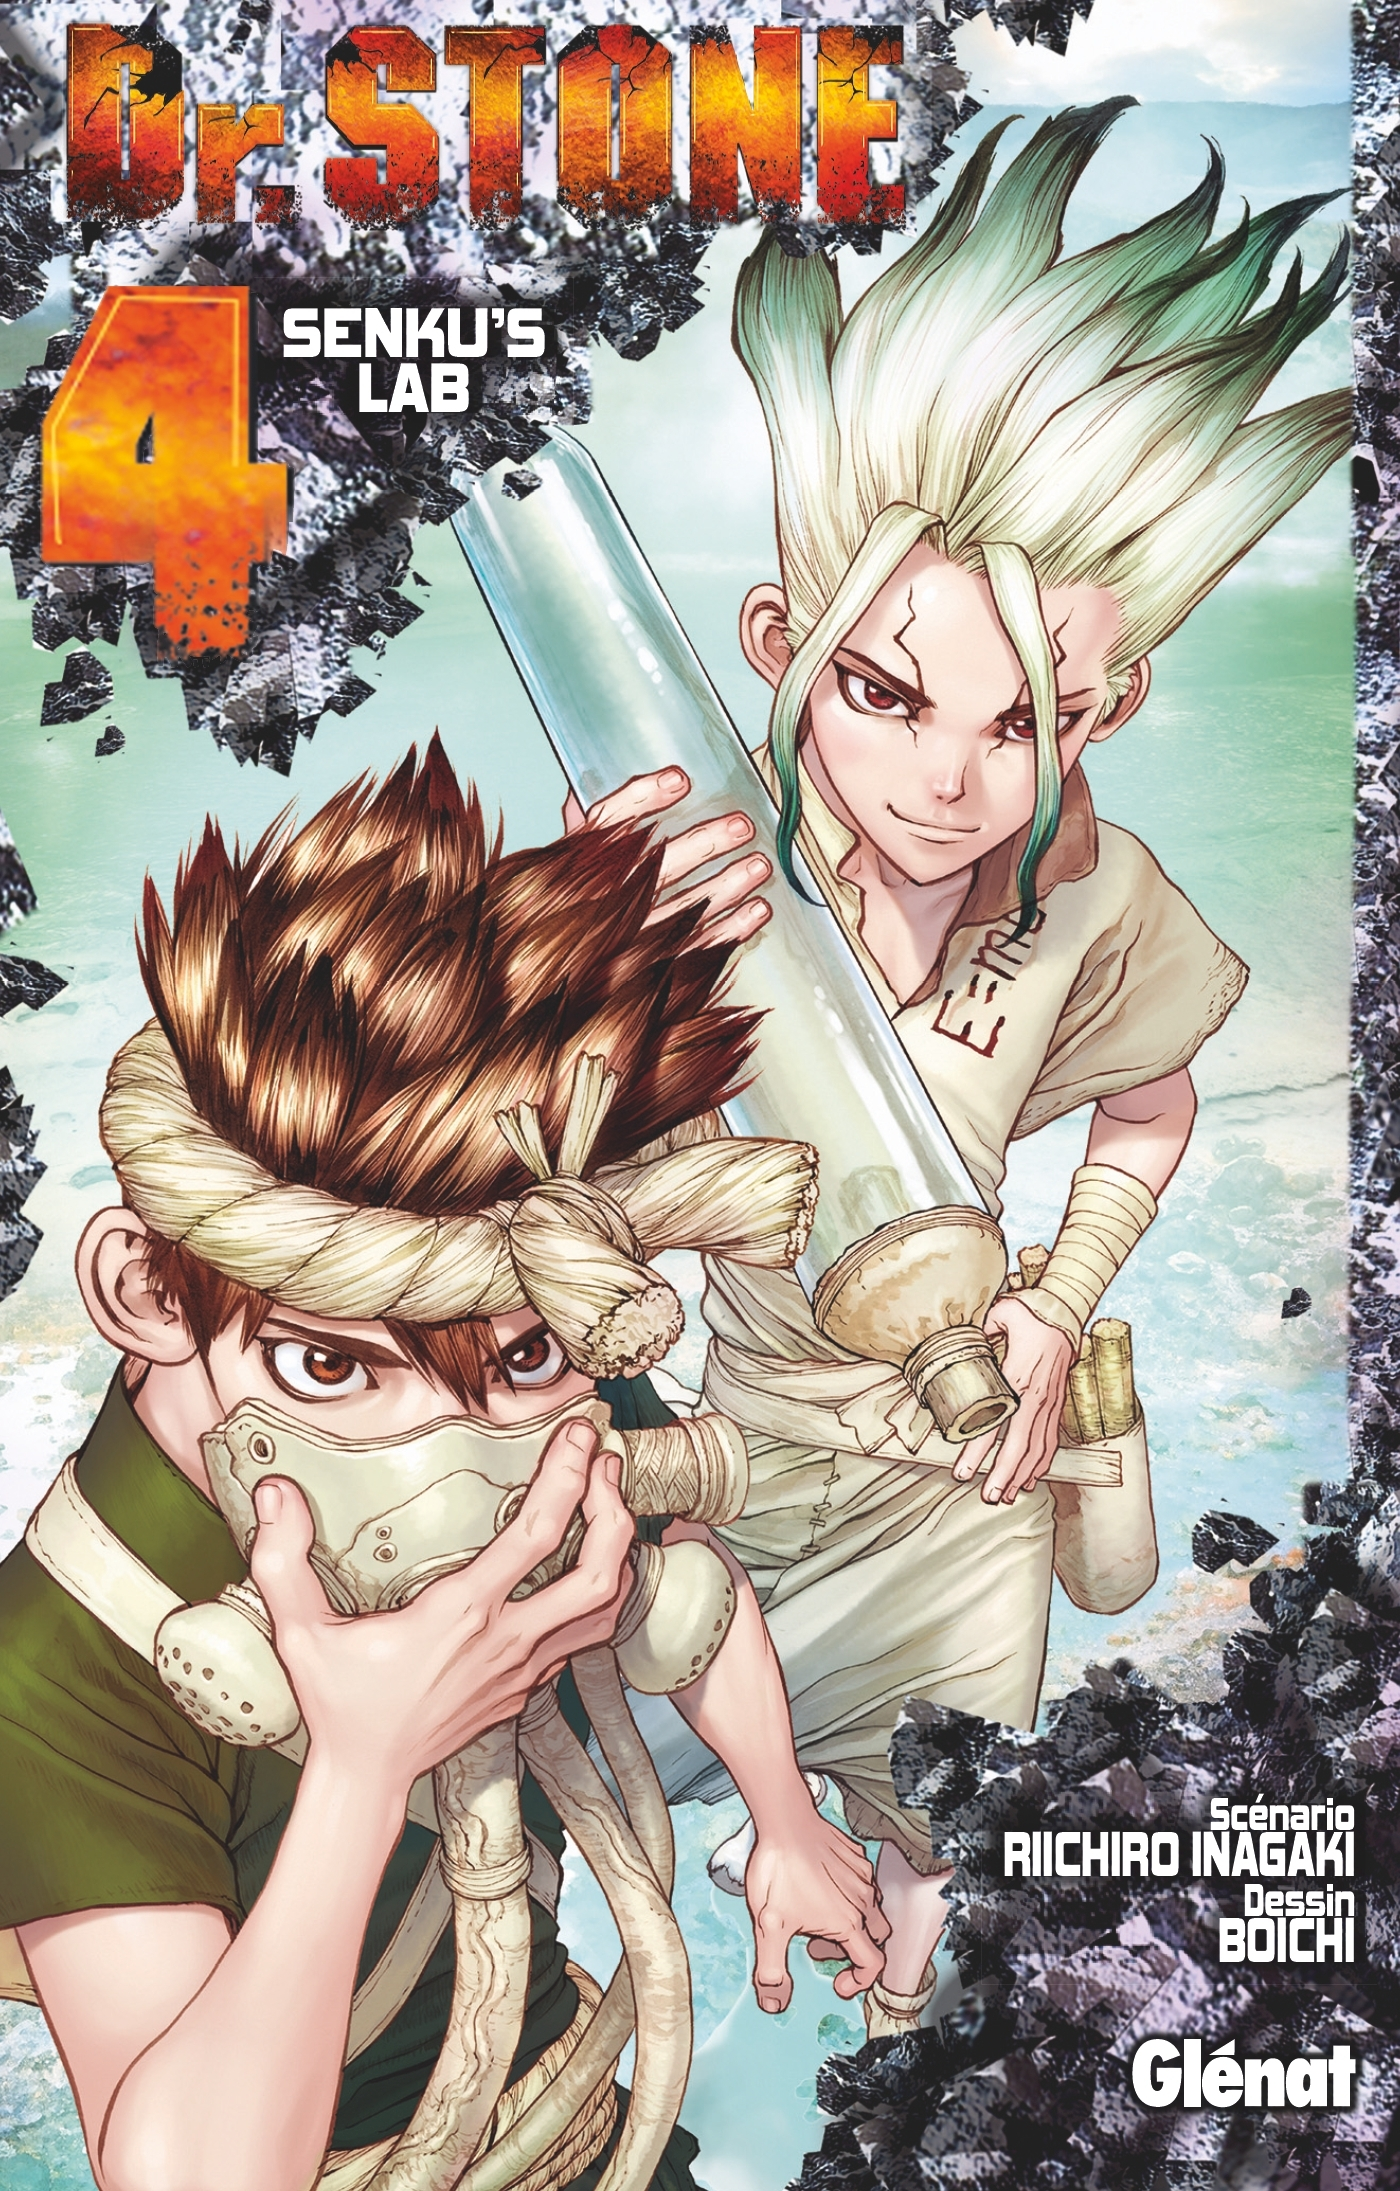 DR. STONE - TOME 04 - SENKU'S LAB